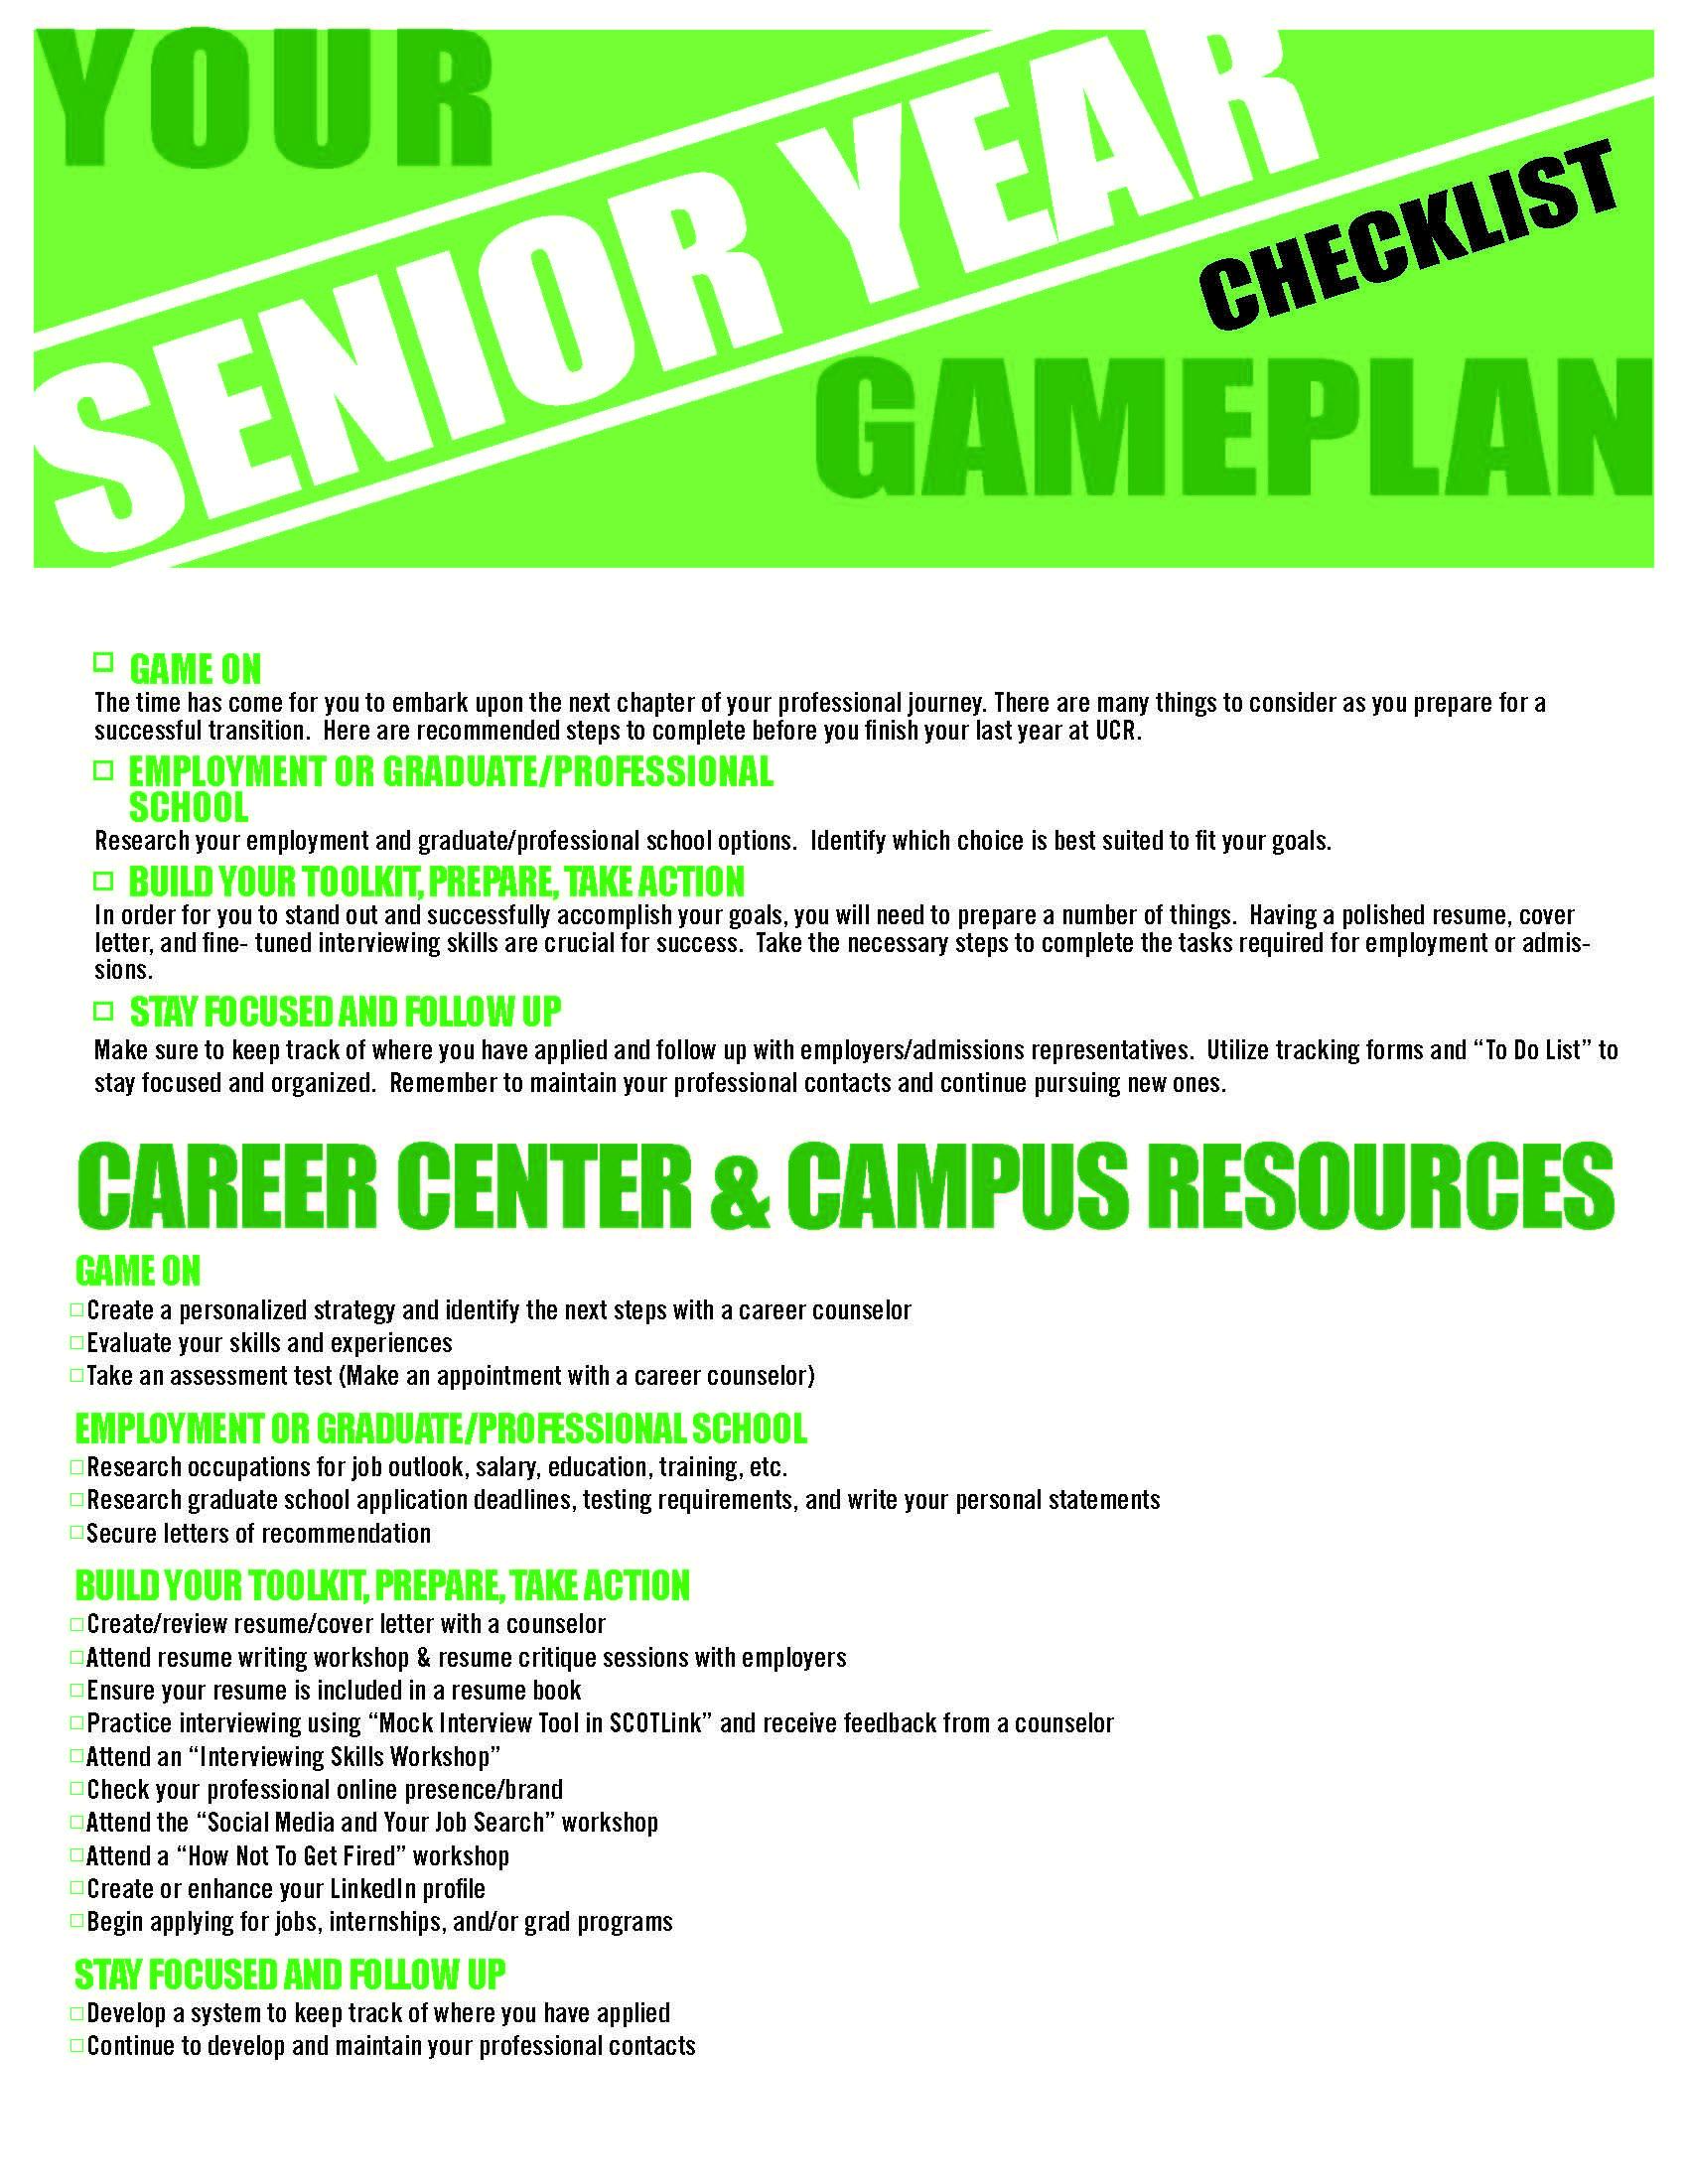 Senior Year Checklist